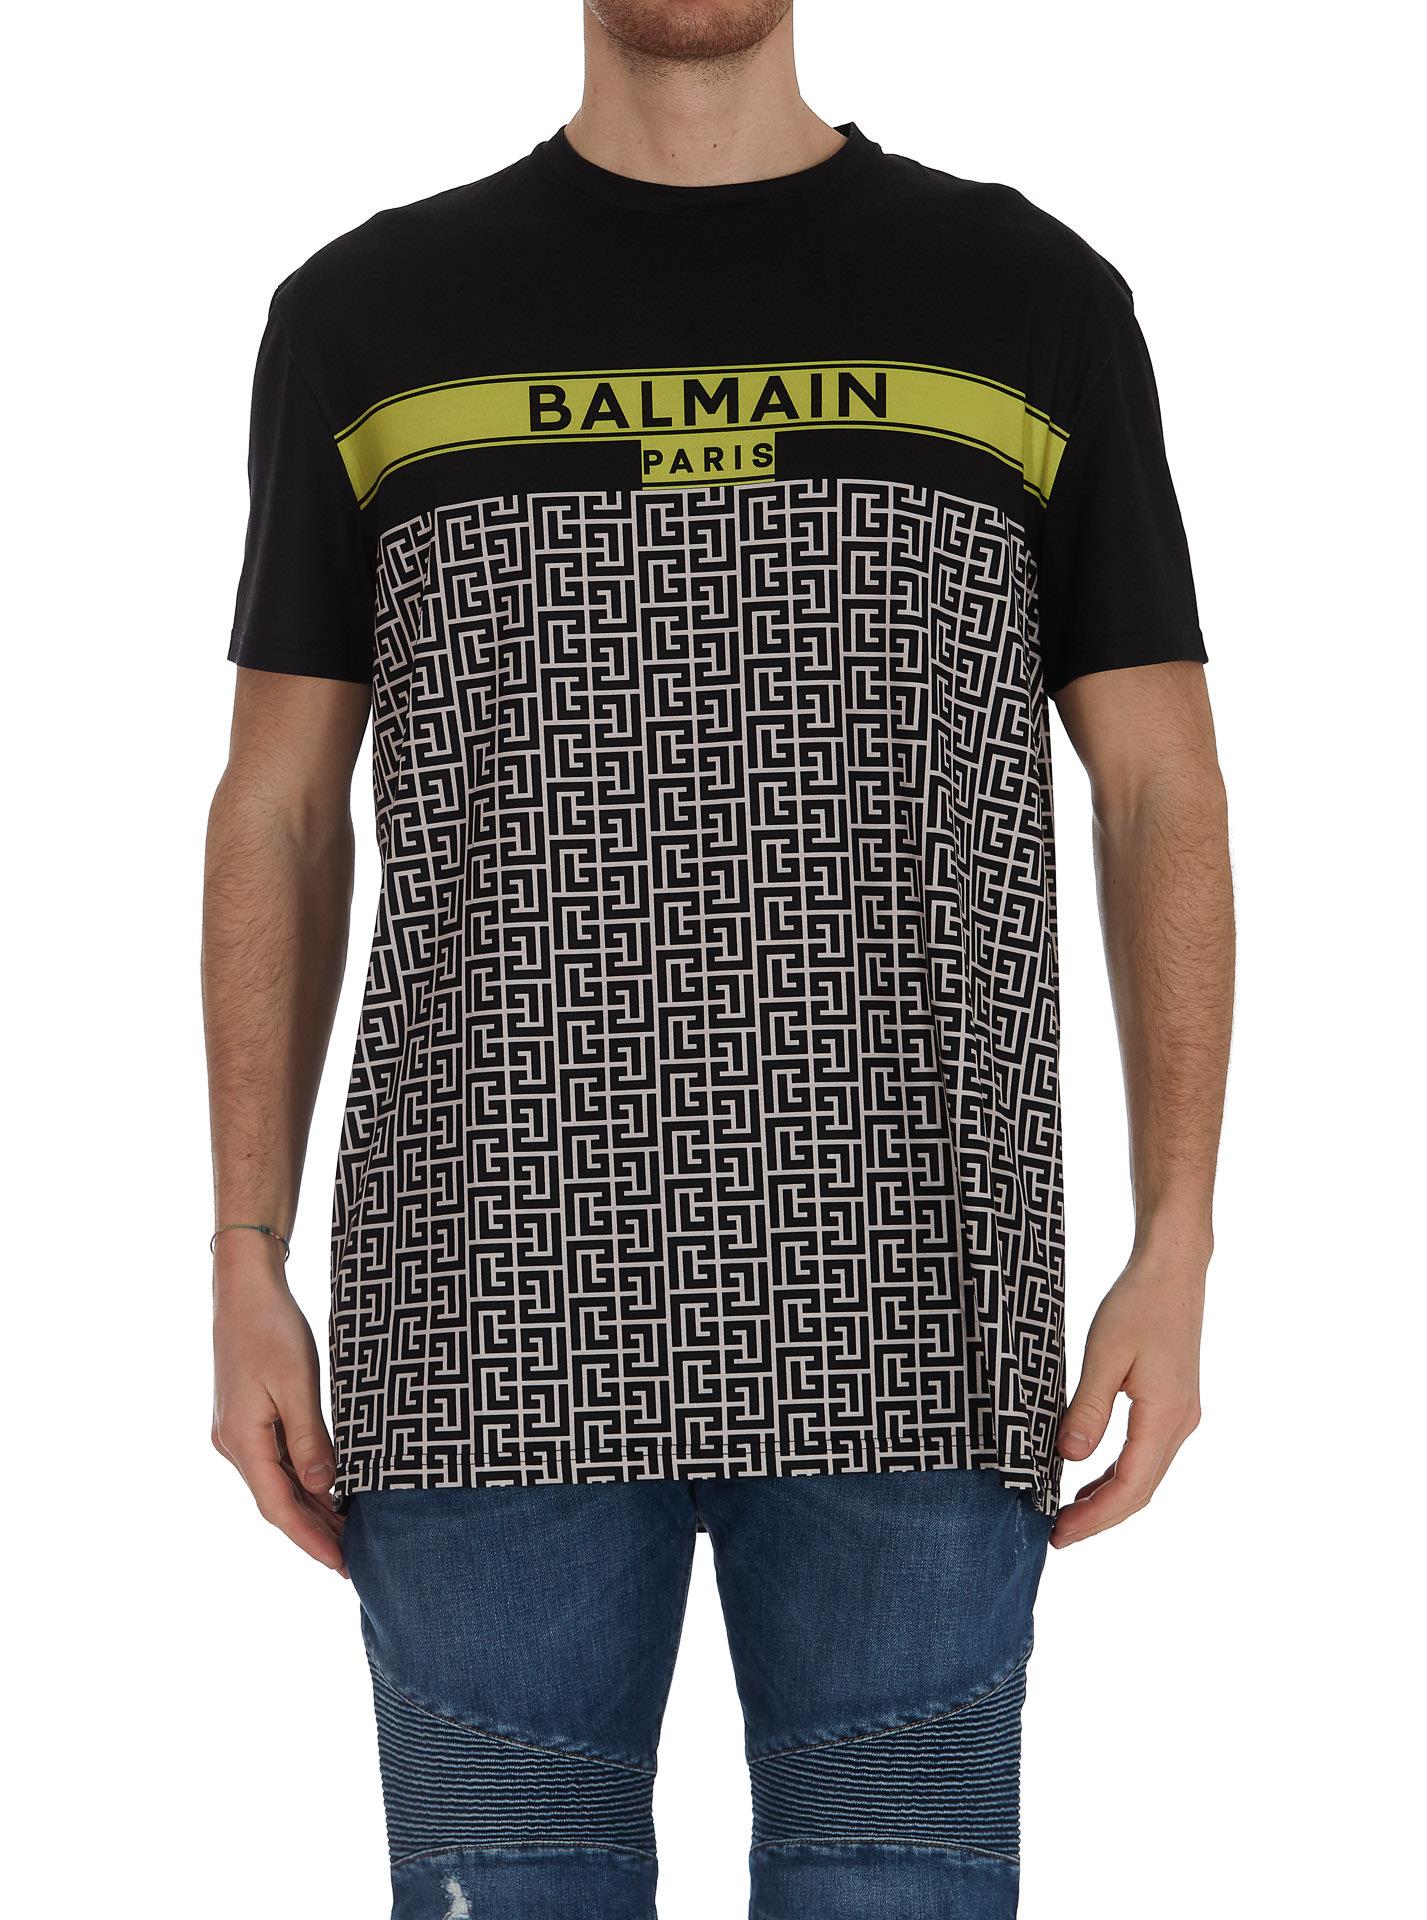 Balmain T-shirts T-SHIRT